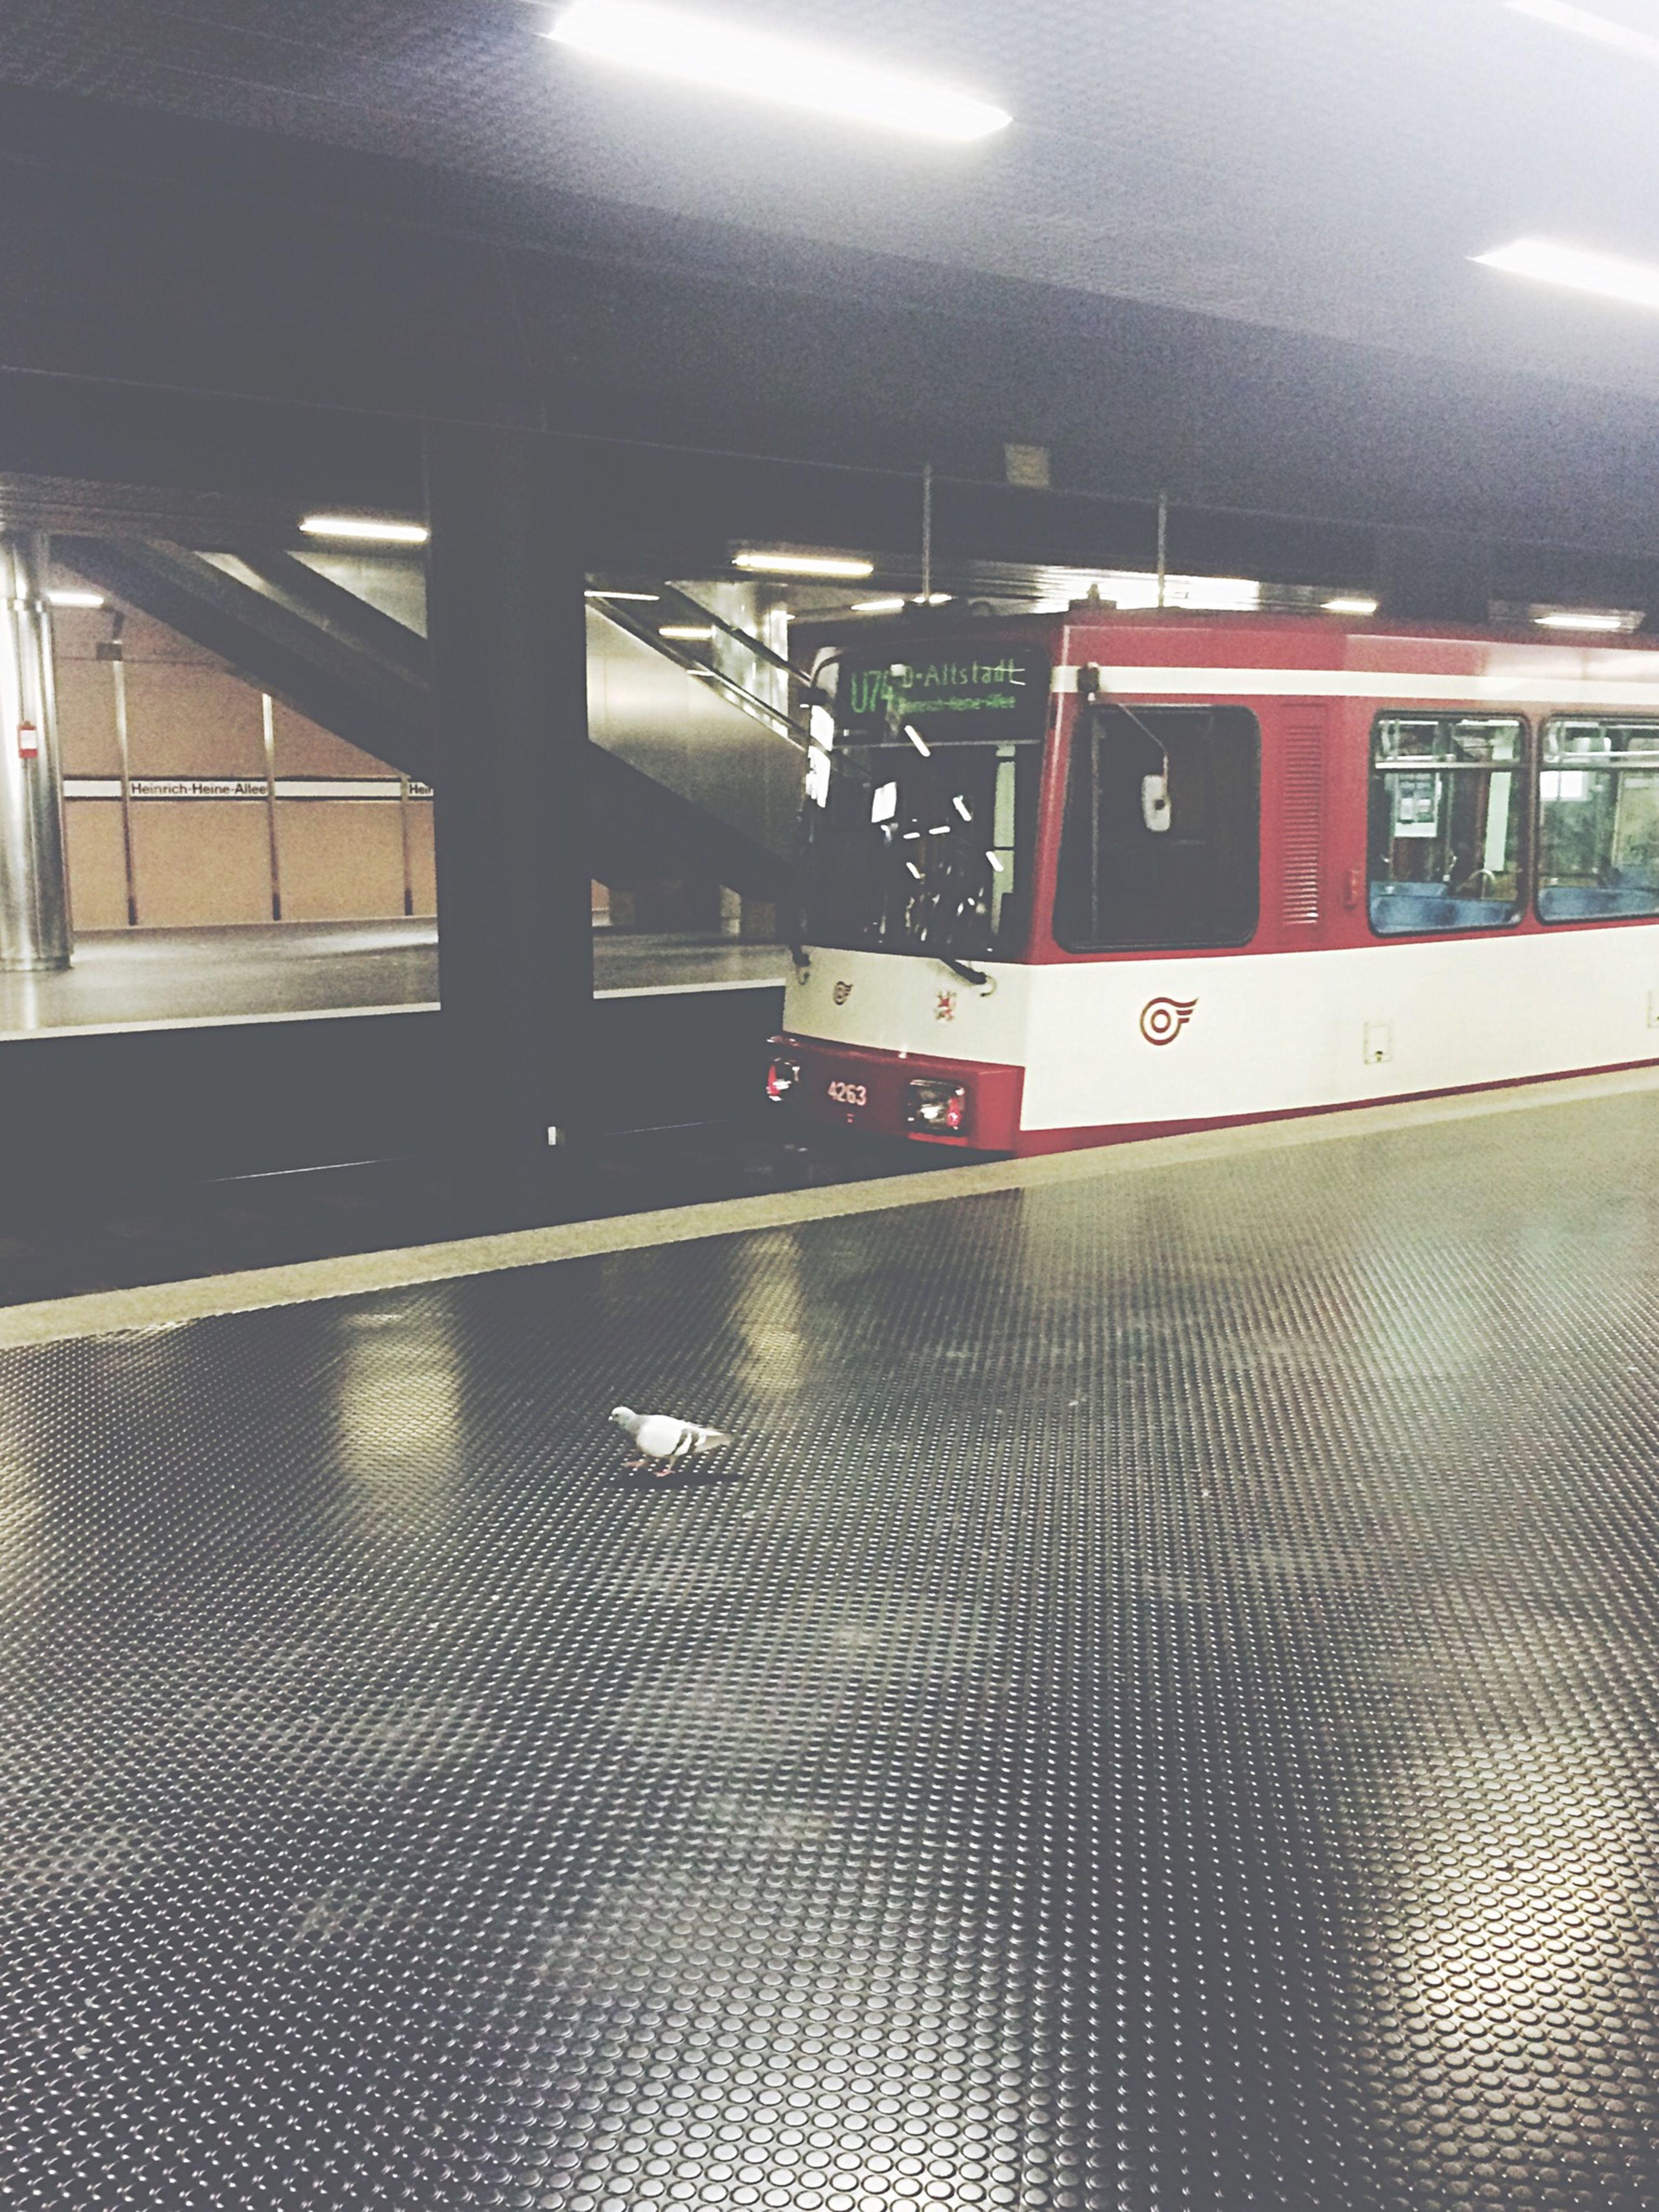 Mostrandomtonight Pigeons Urnevergonnagetout Idiot Train Staubsaugen